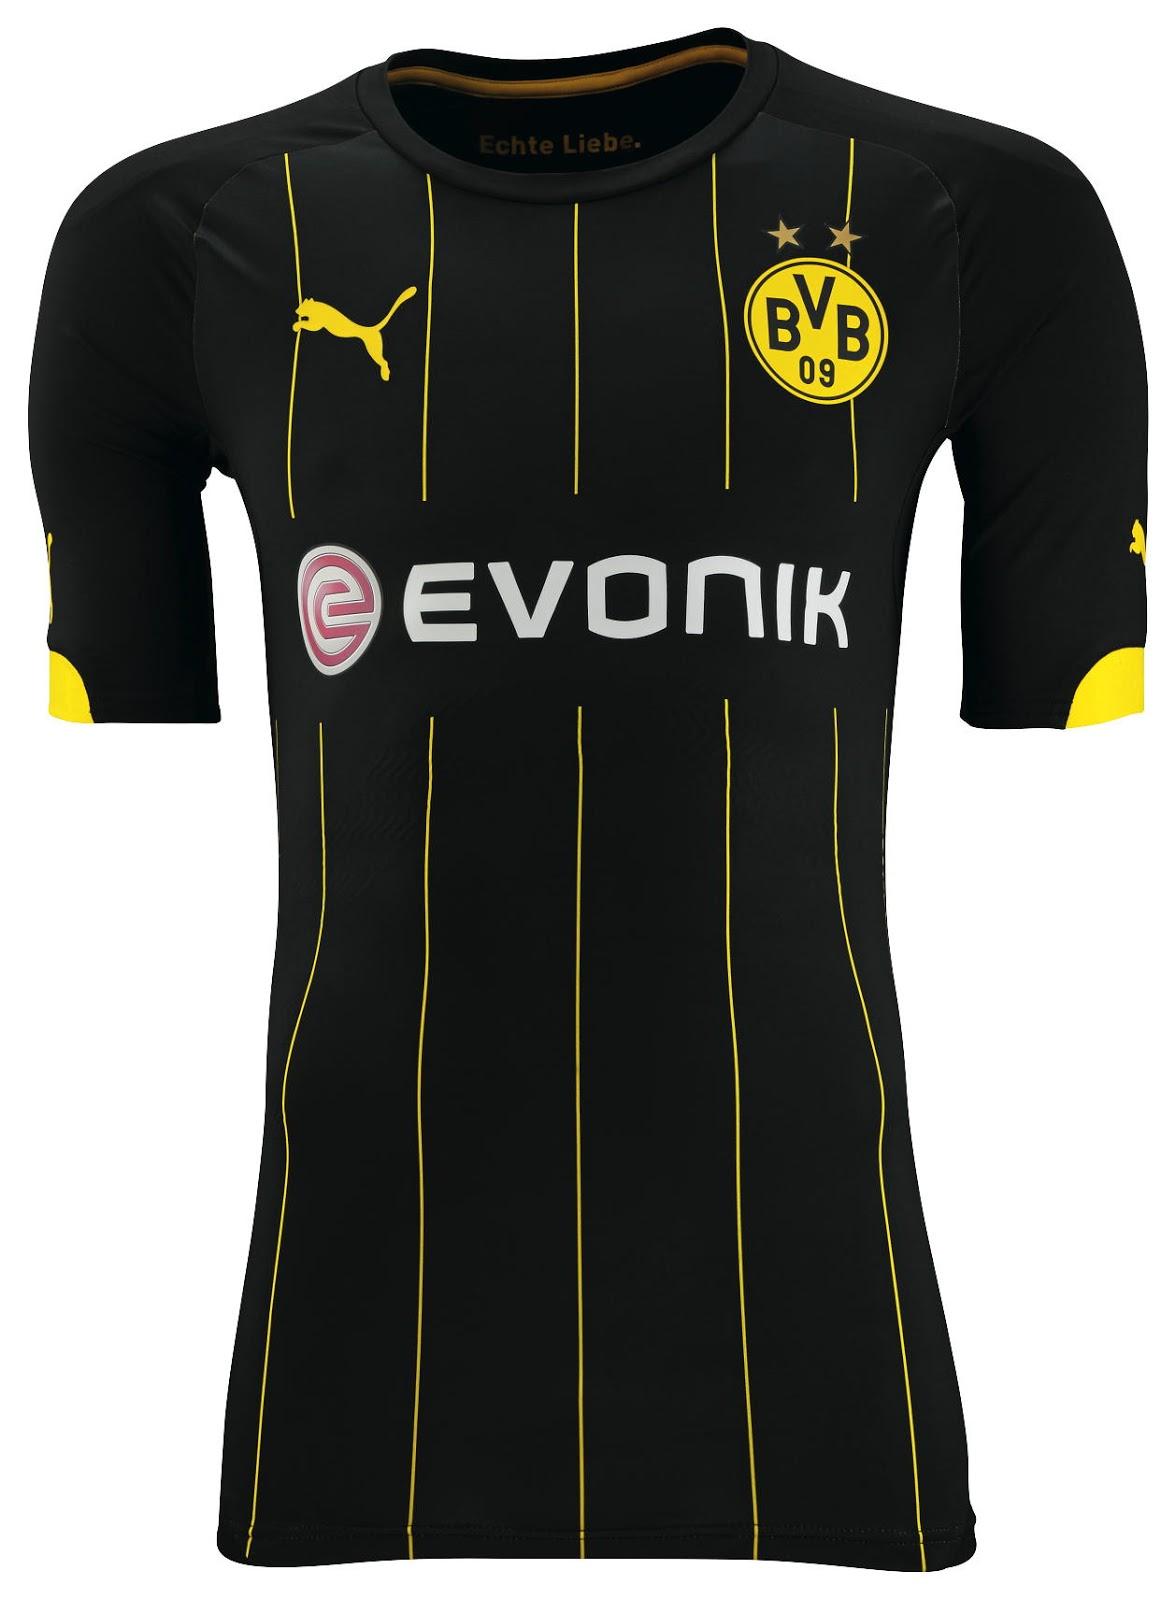 New Borussia Dortmund 14-15 Kits Released